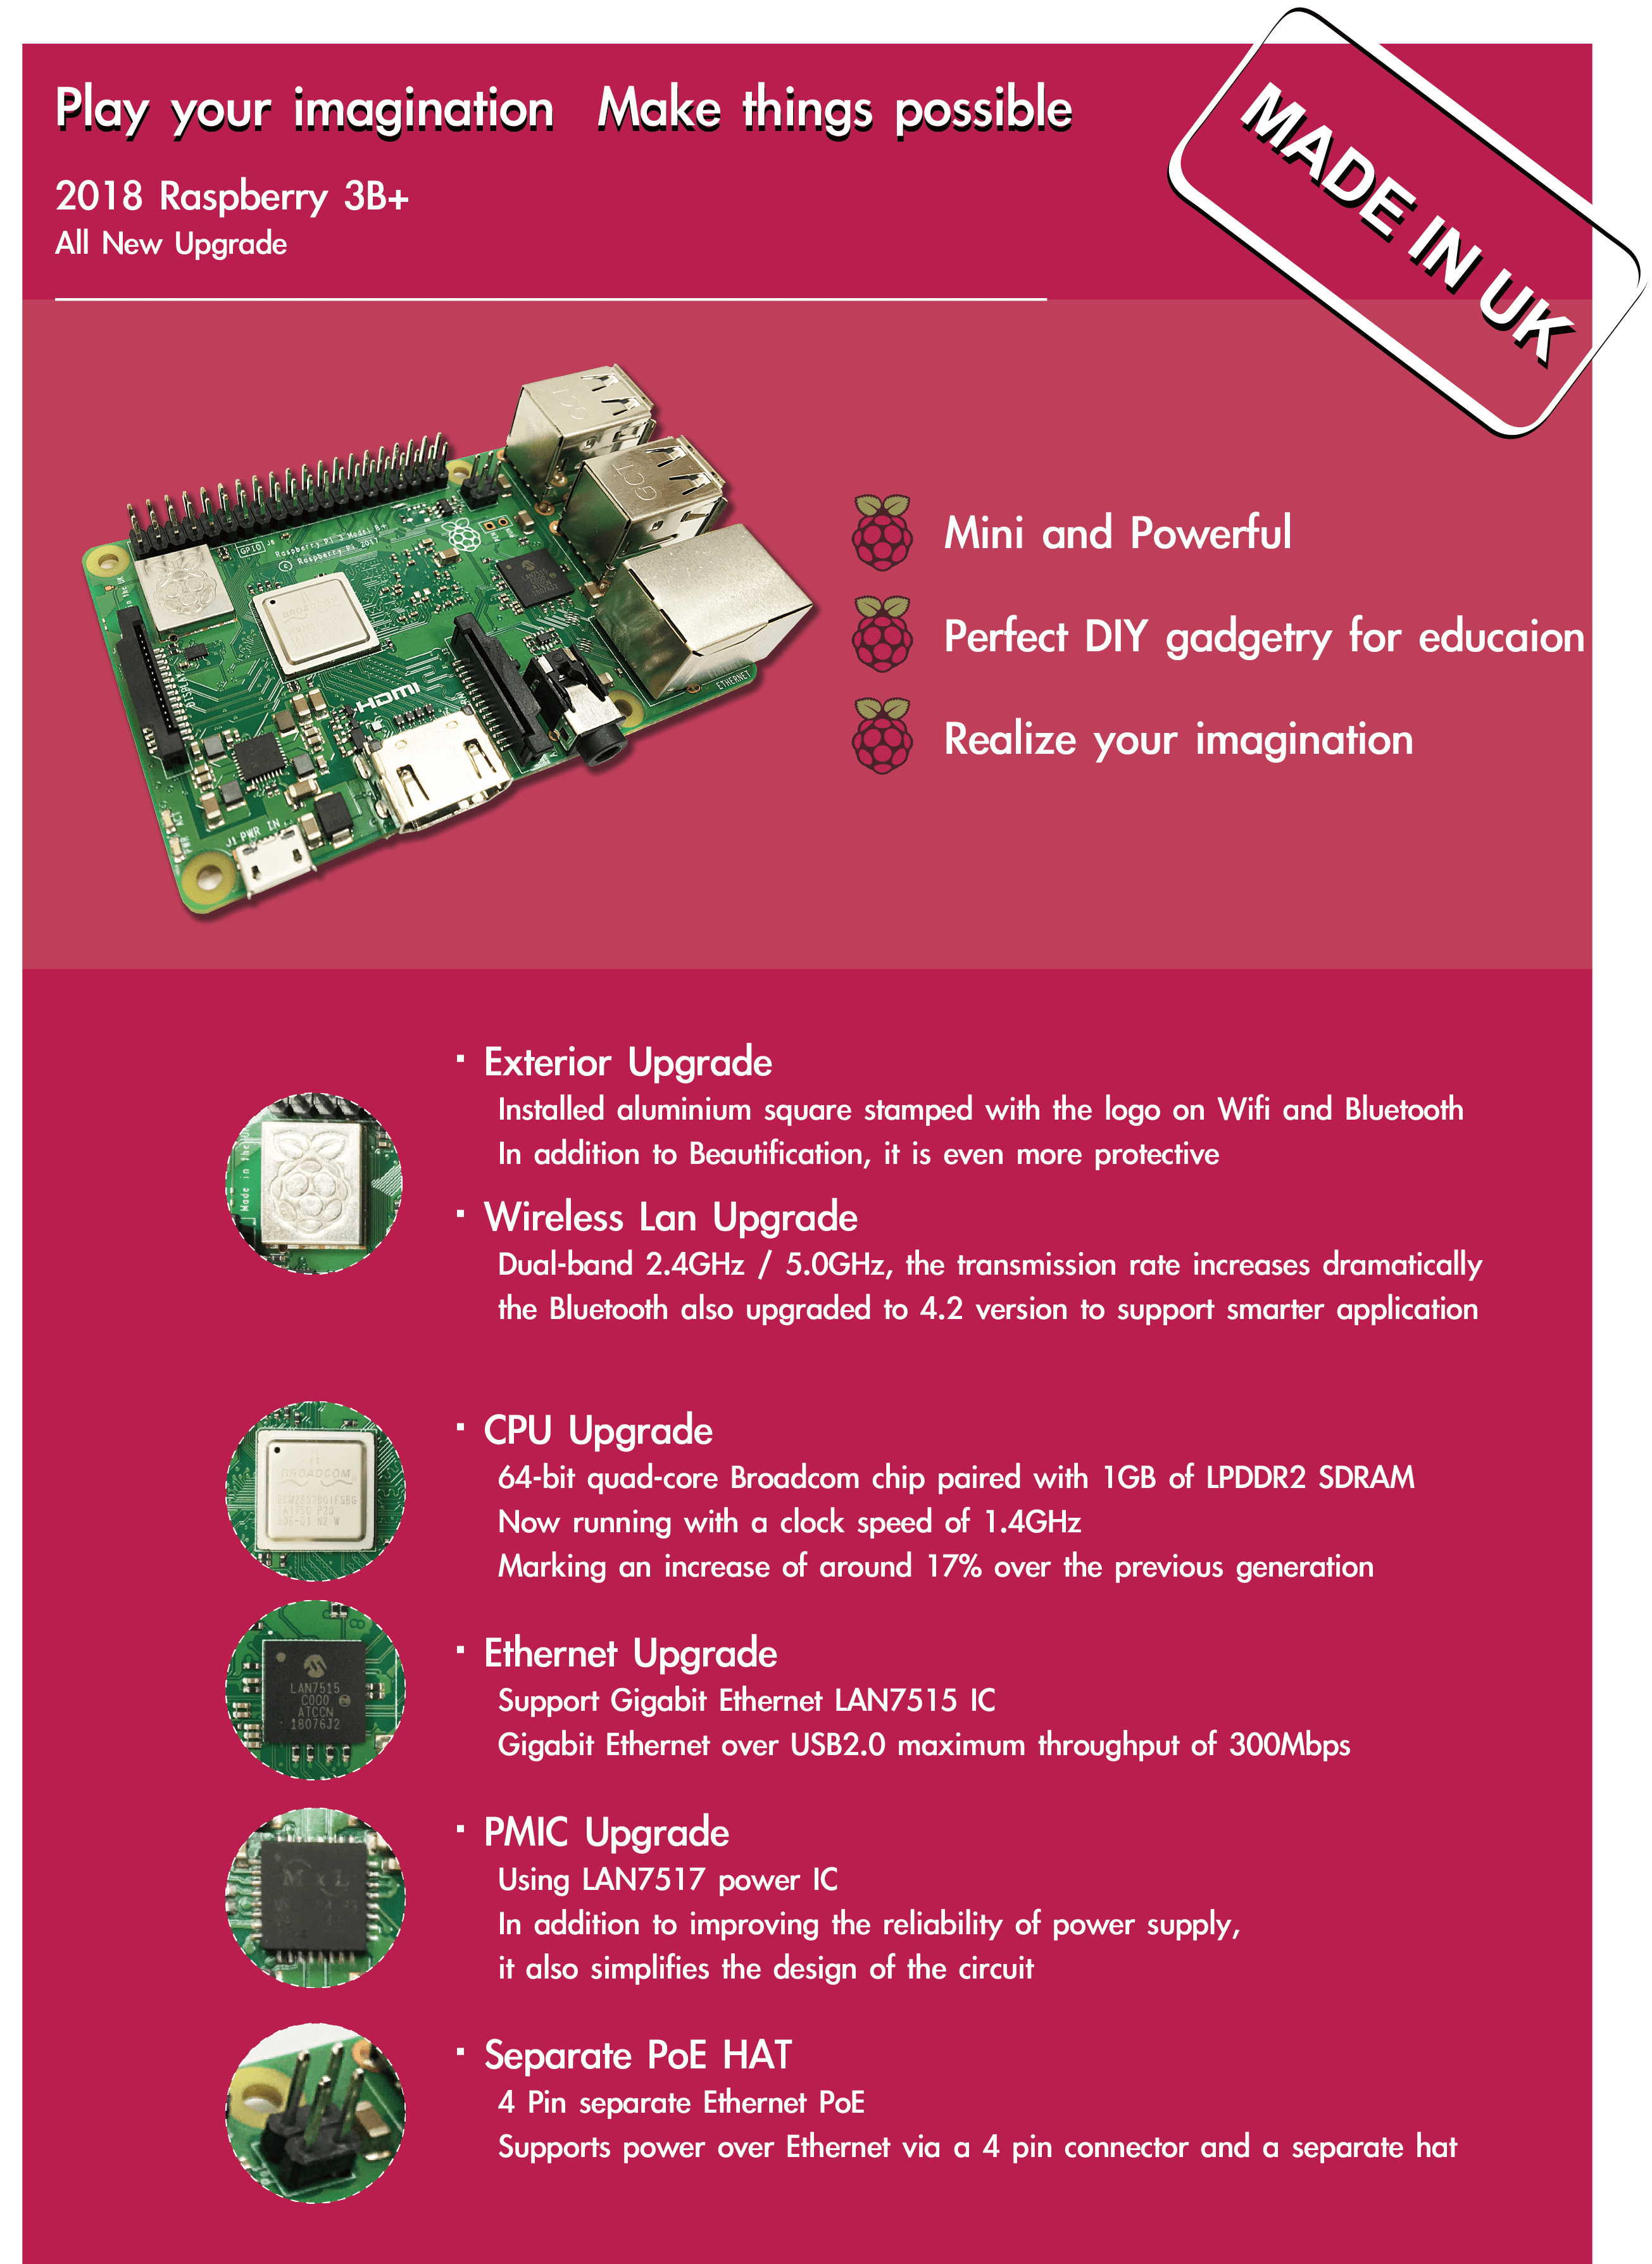 Raspberry Pi 3 Model B+ new upgrade